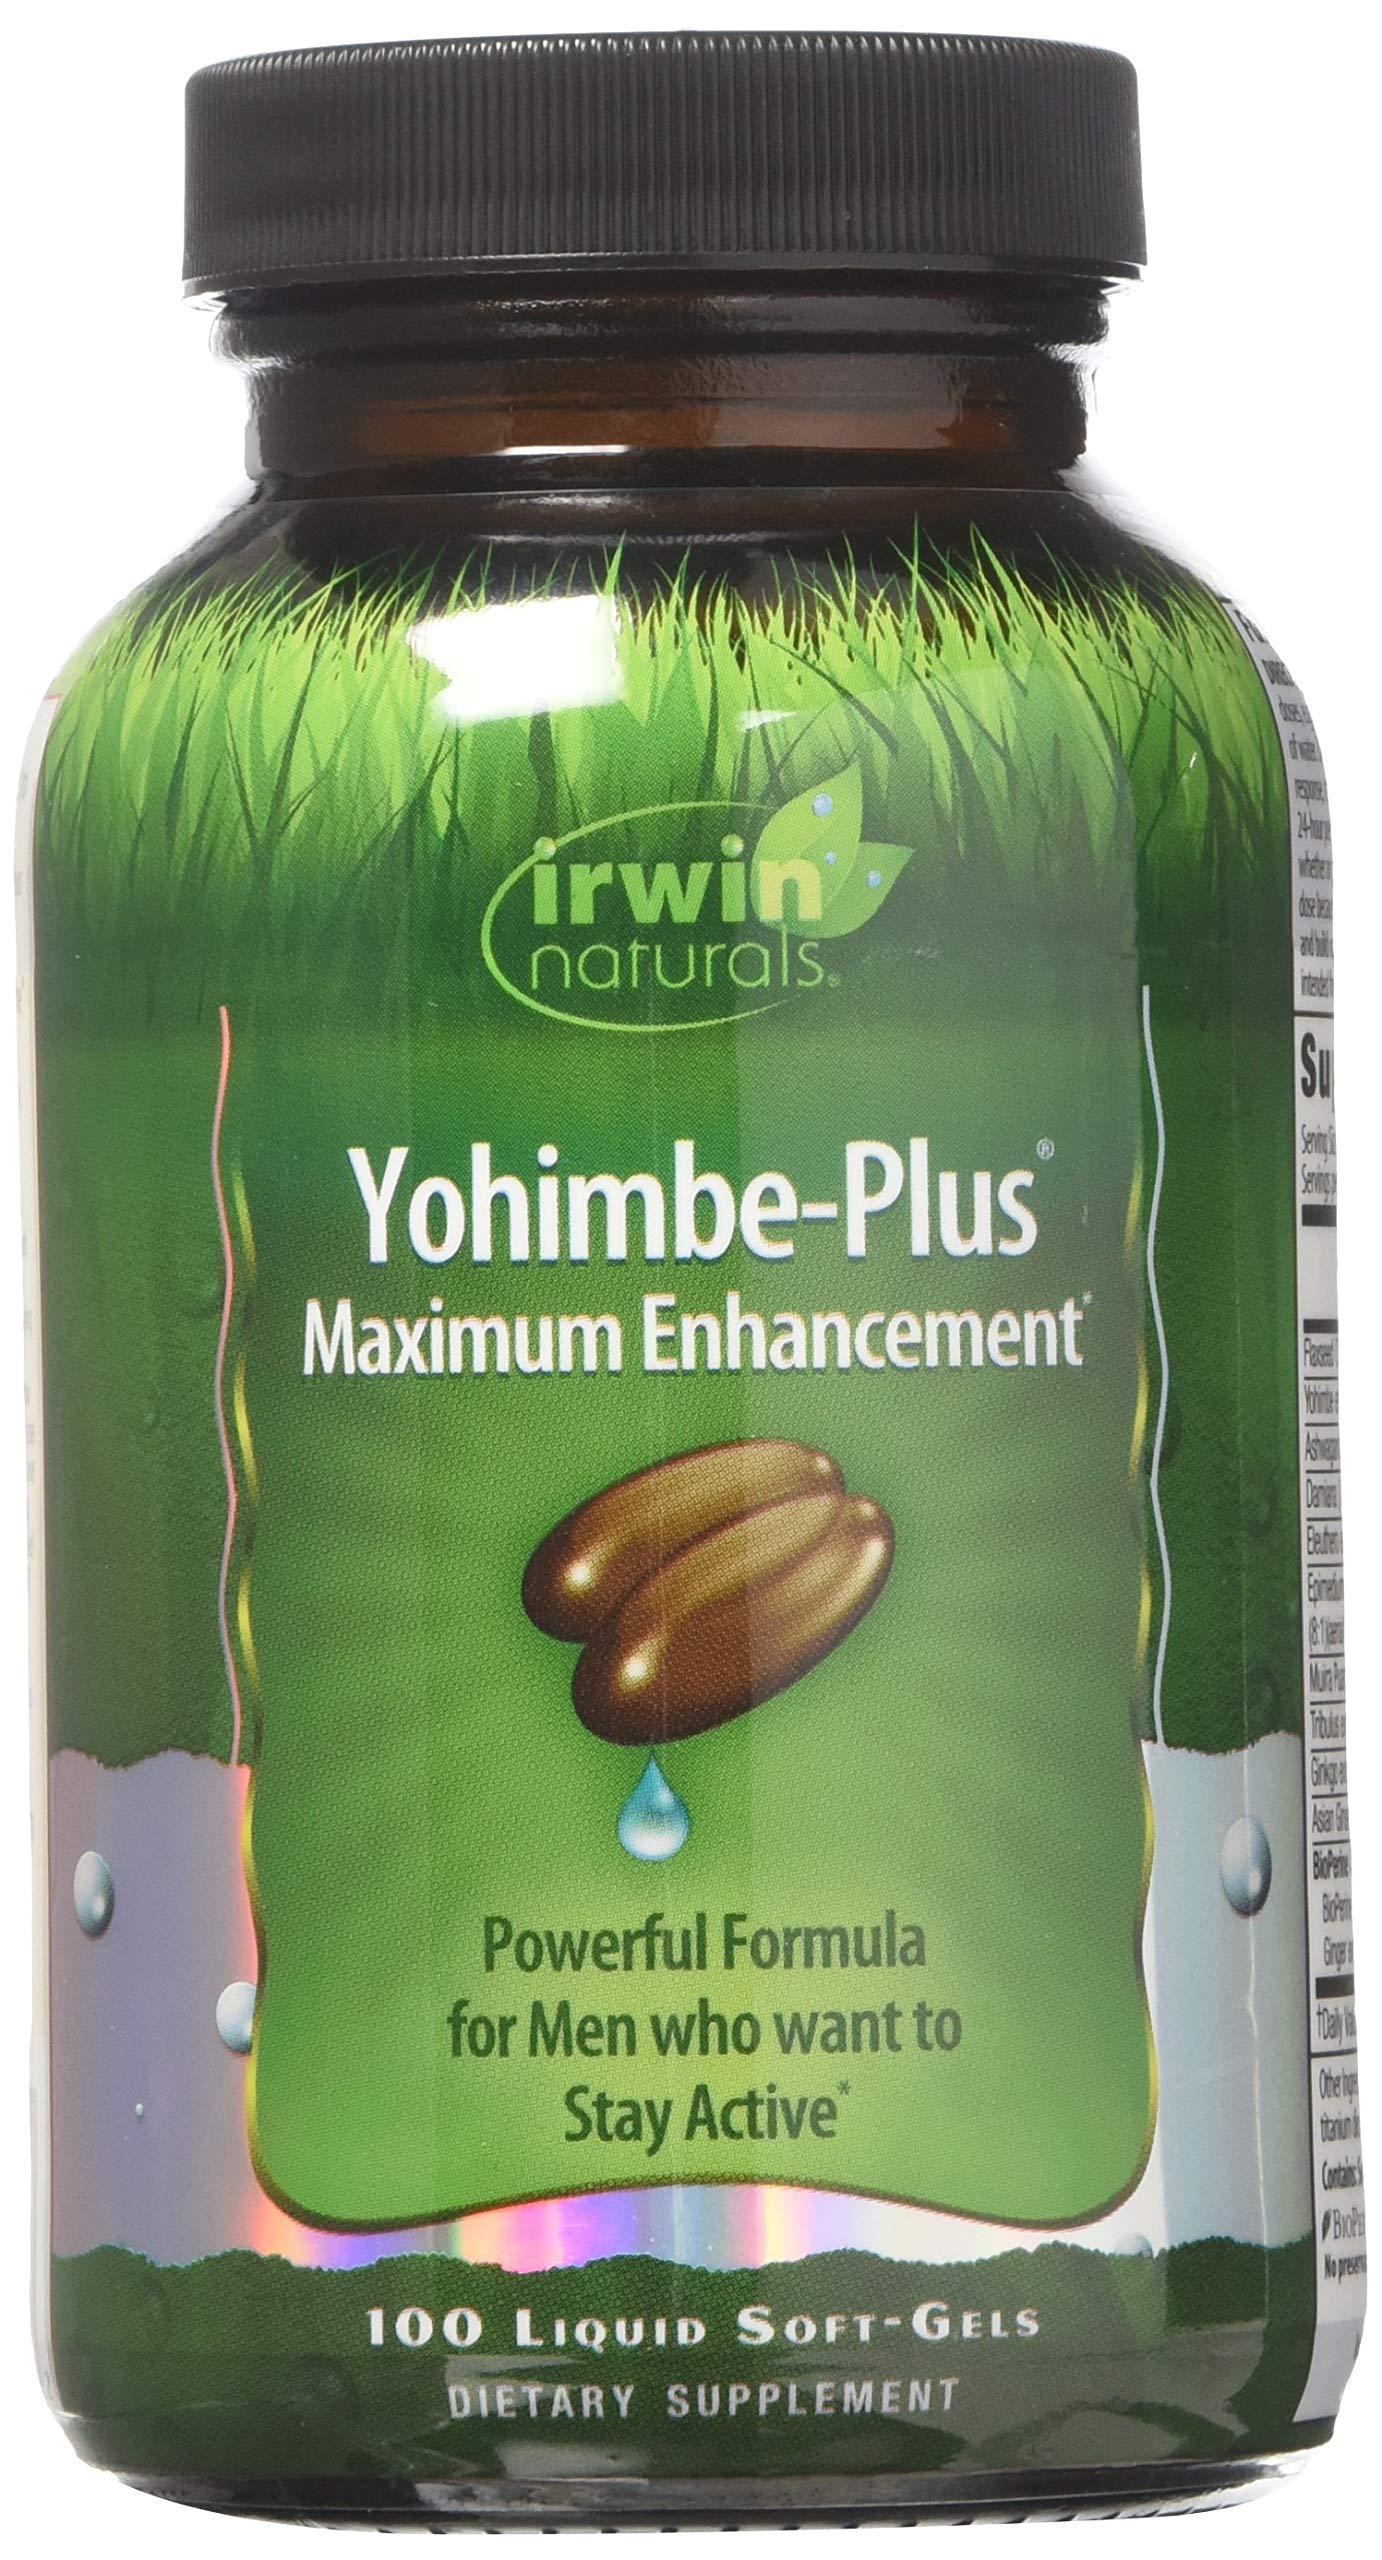 Irwin Naturals Advanced Yohimbe Plus Dietary Supplement Liquid Gel Caps, 100-Count Bottles (Pack of 2)